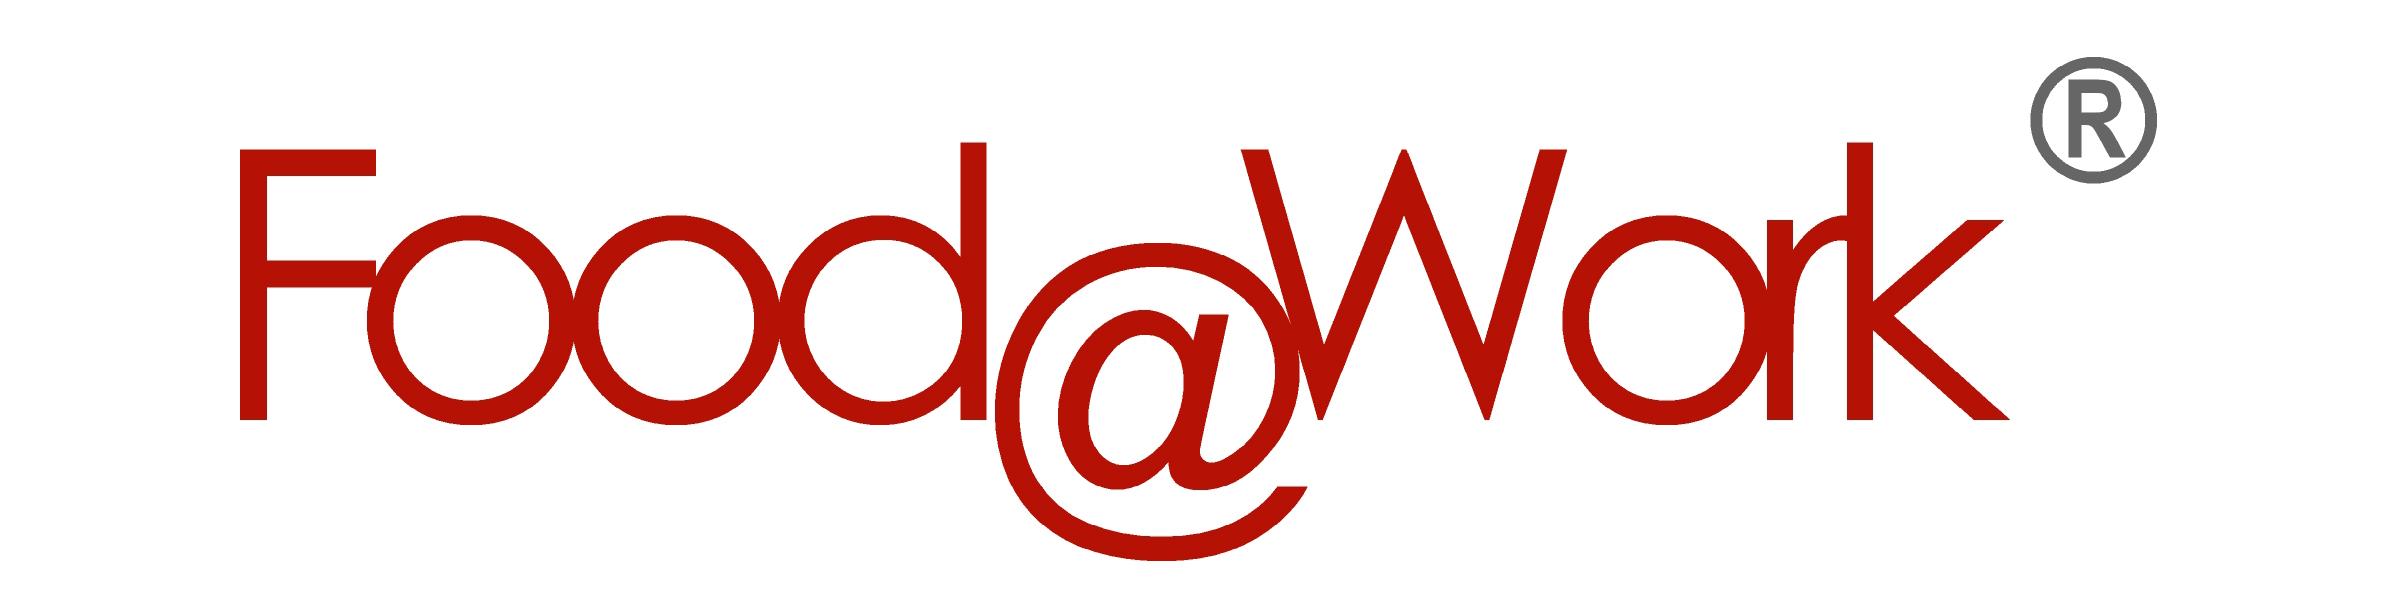 Food@Work Logo.jpg